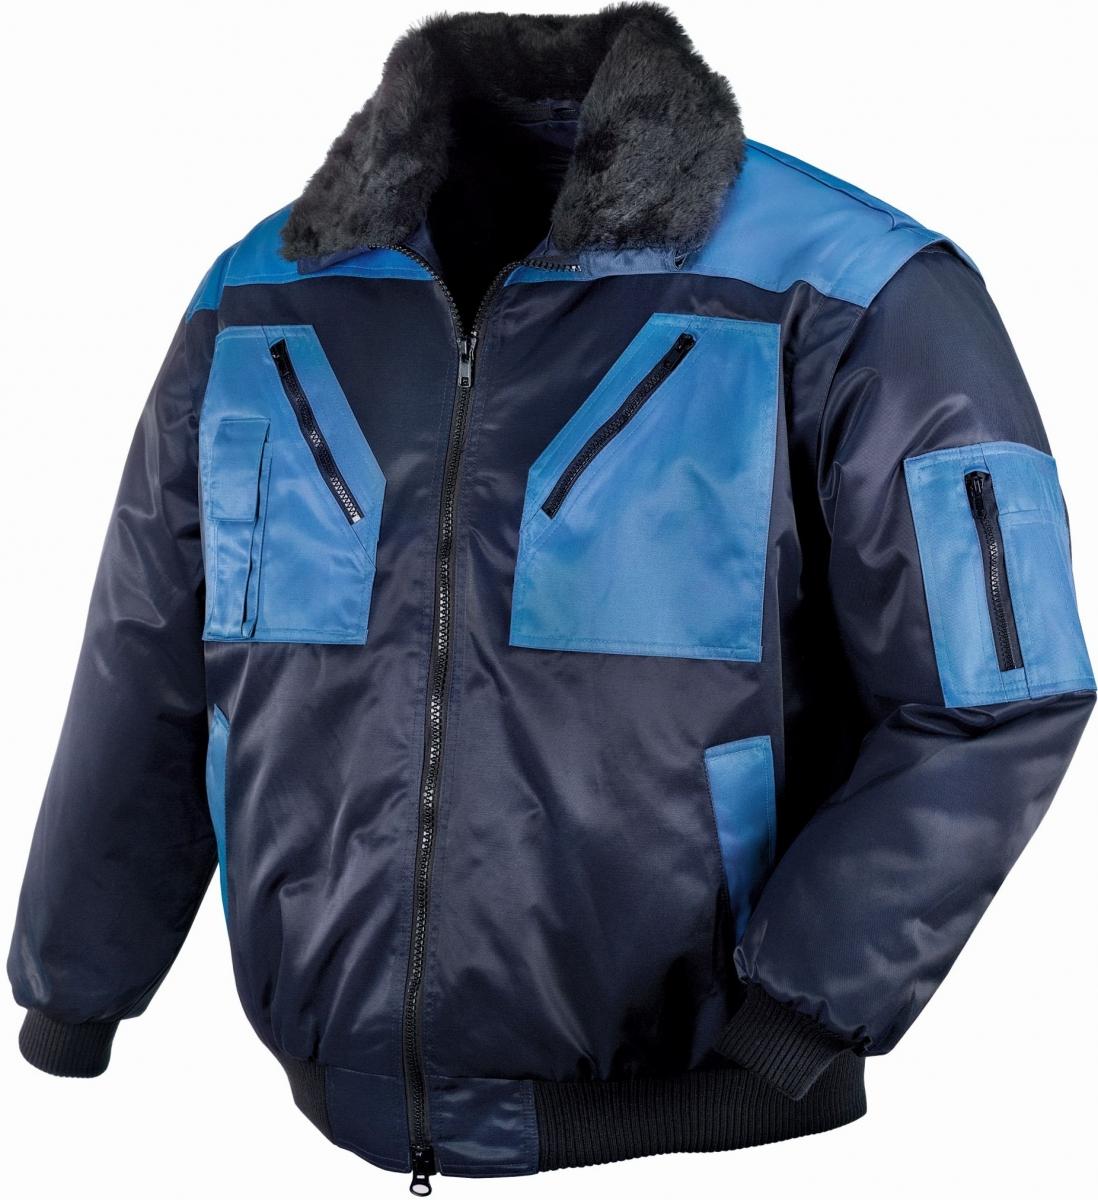 BIG-TEXXOR-Kälte-Schutz, Winter-Arbeits-Berufs-Piloten-Jacke, Oslo, marine/kornblau